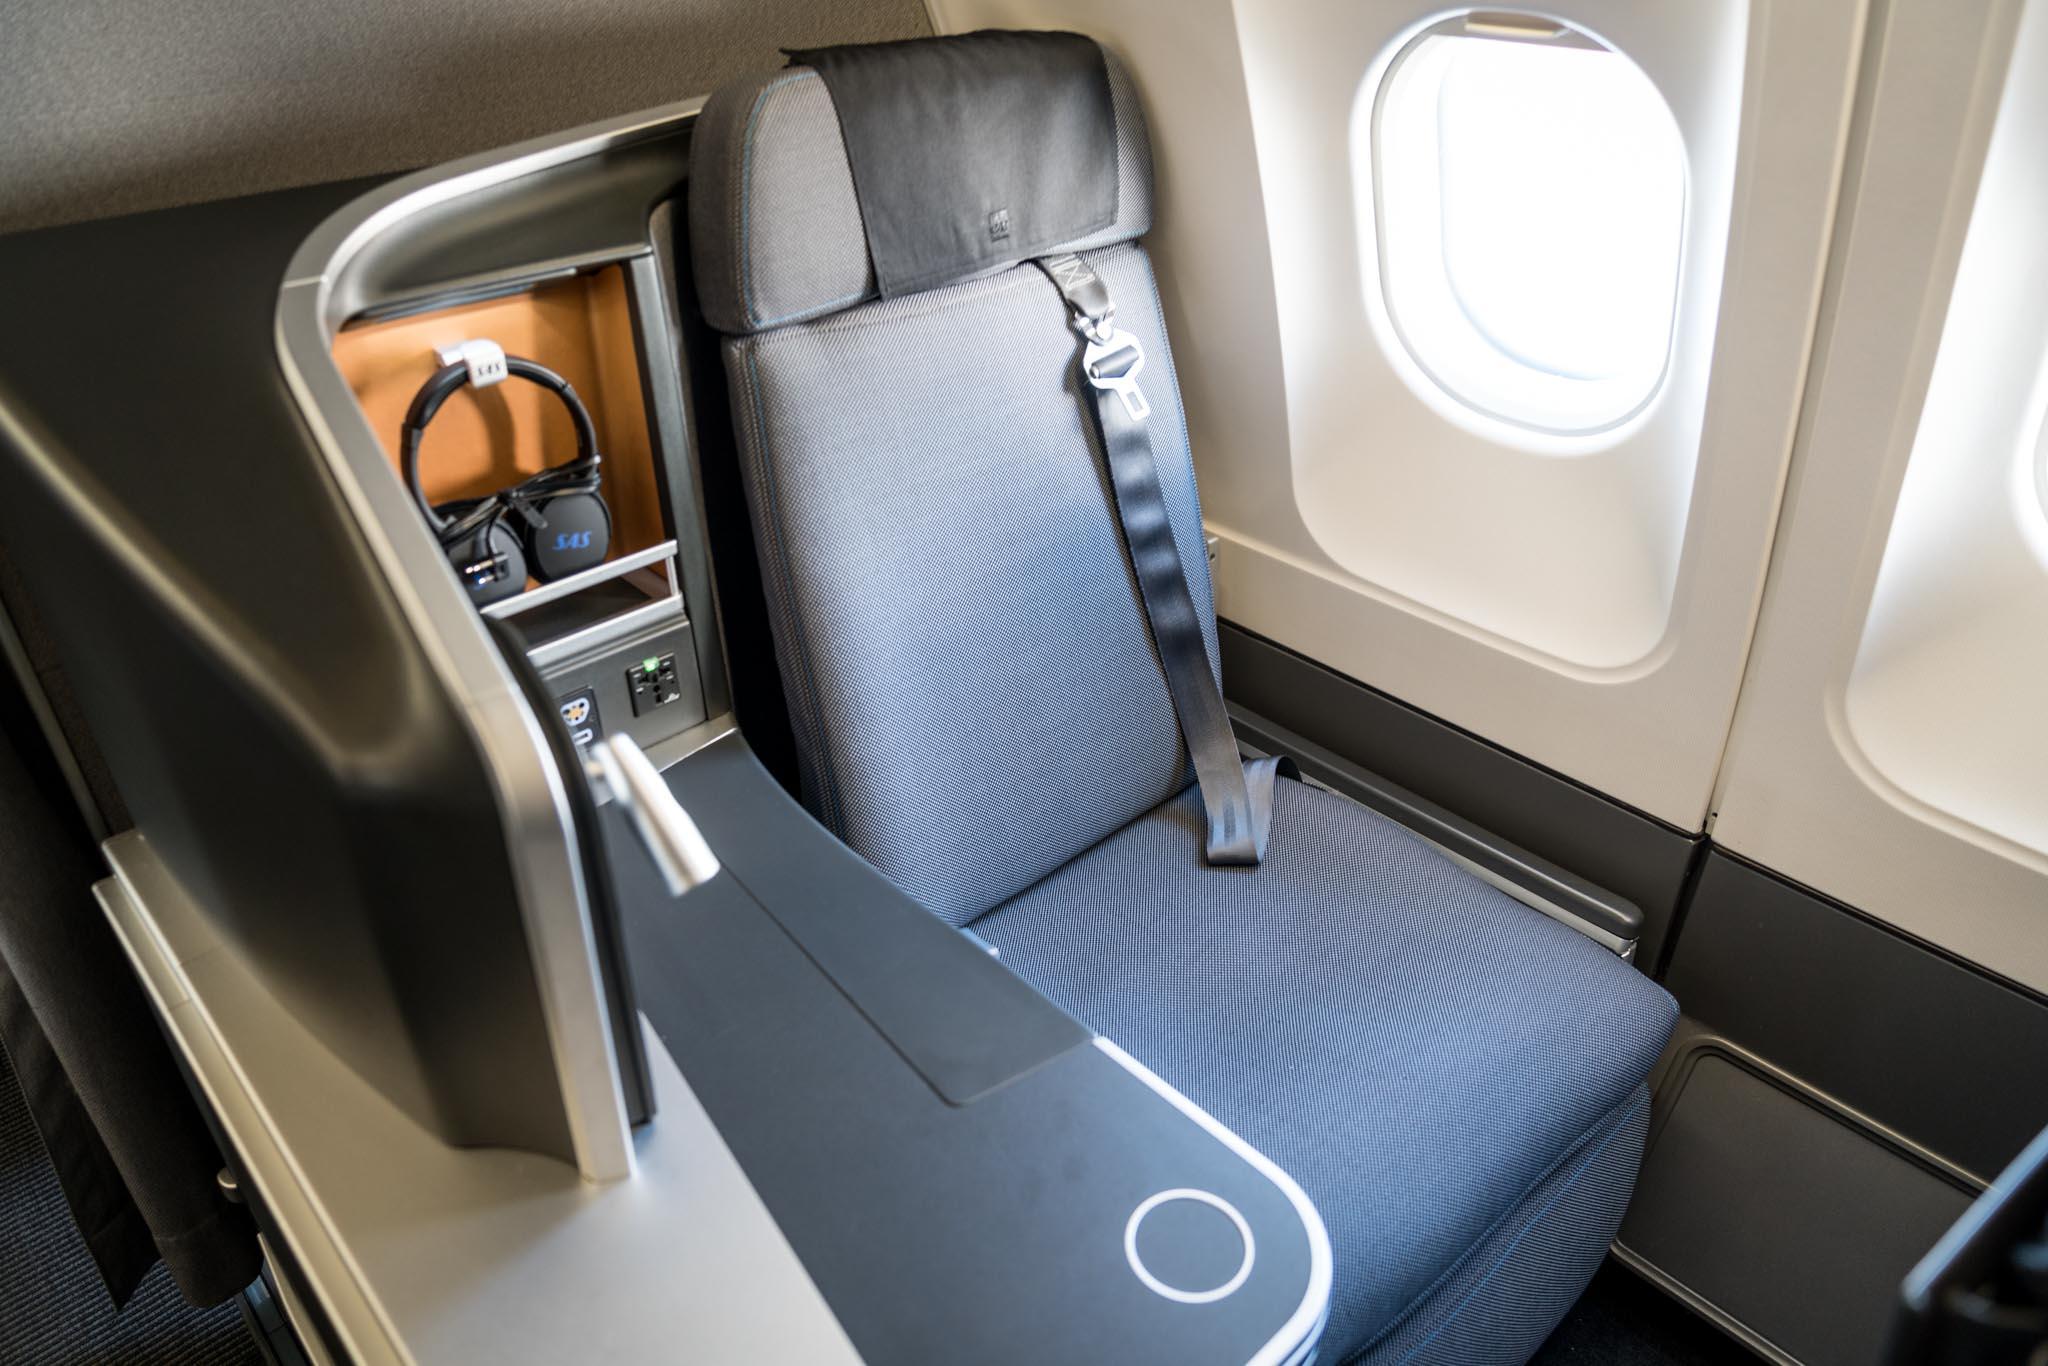 SAS-business-class-review-9.jpg